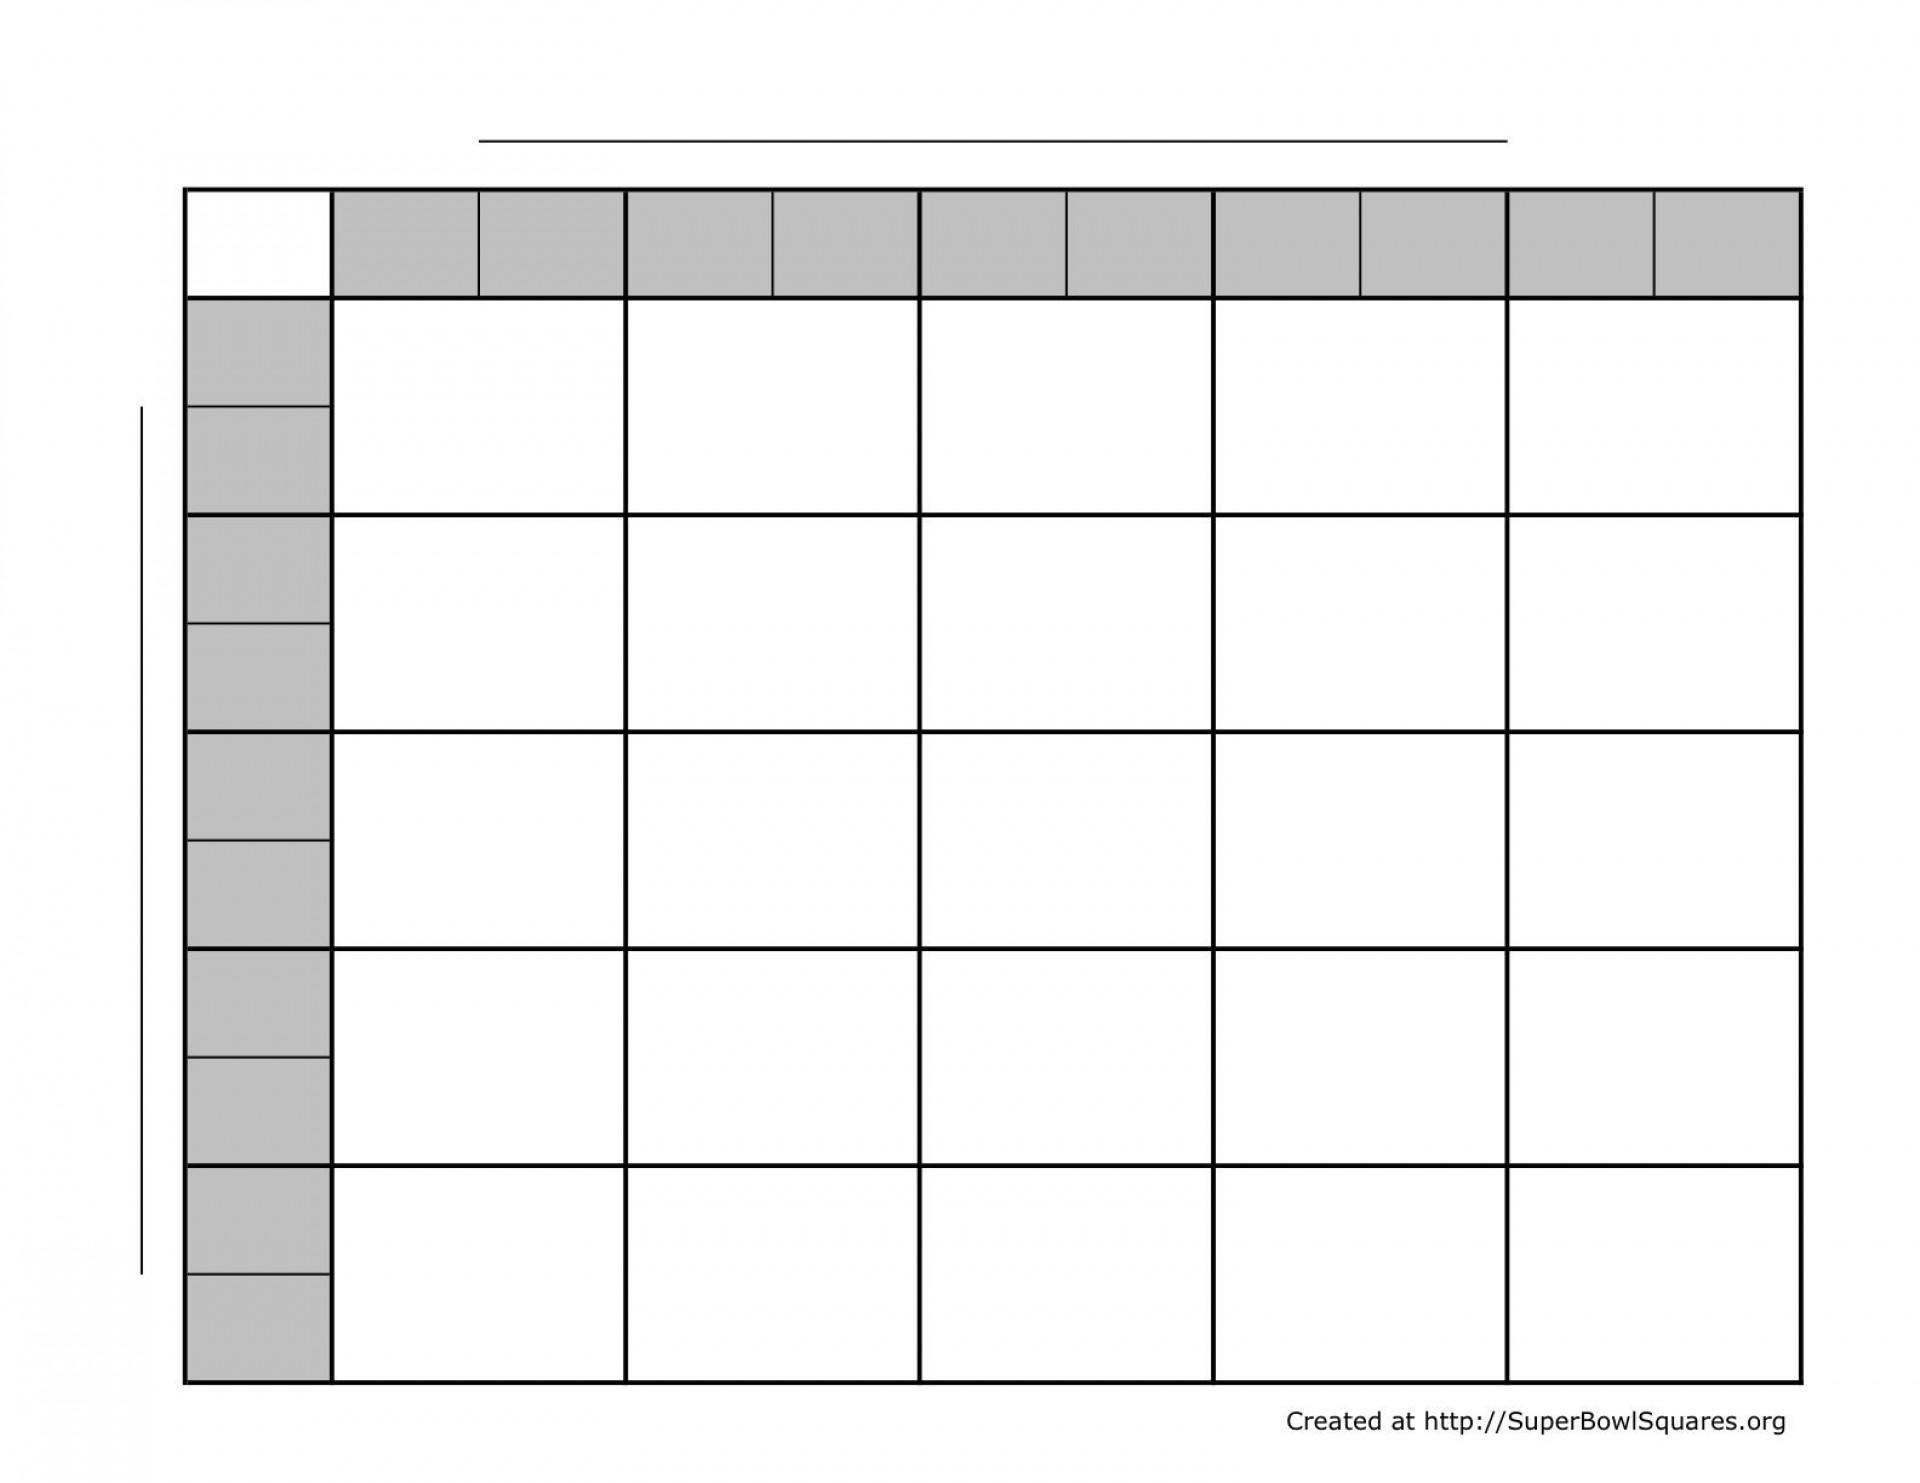 005 Wonderful Football Square Template Excel Image  Printable Pool1920